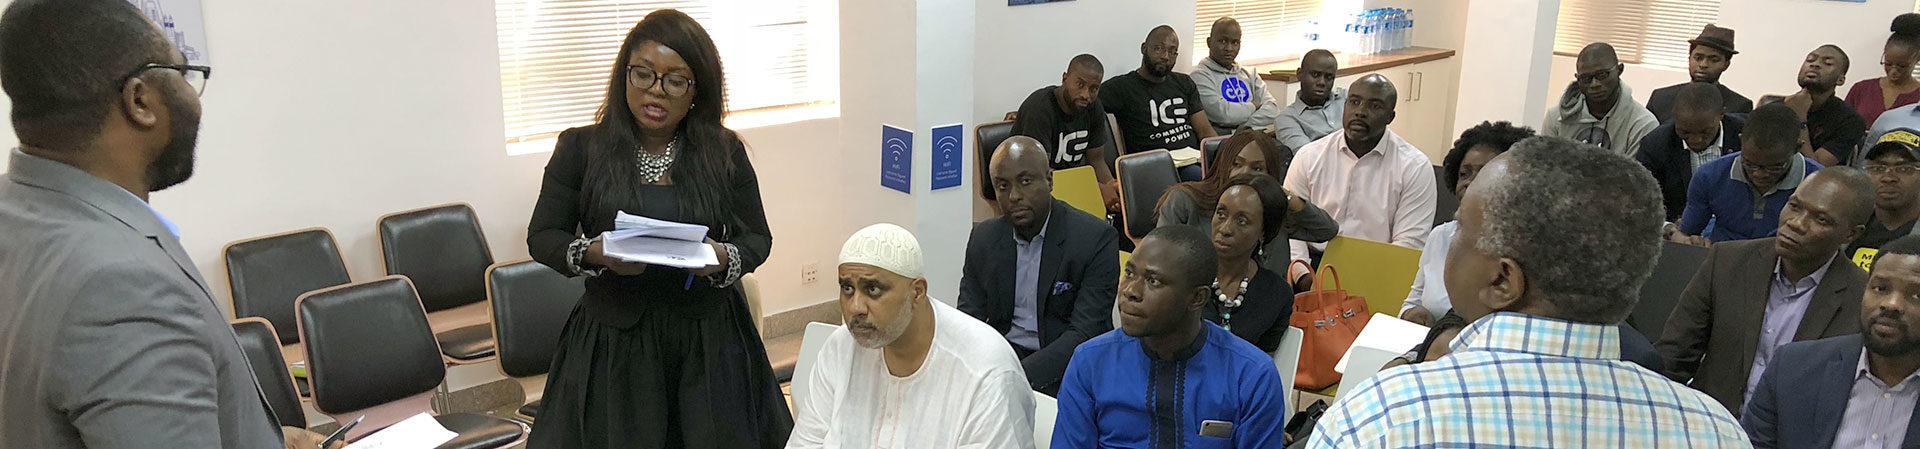 Make-IT Mentor-Driven Capital Program (Lagos and Nairobi)